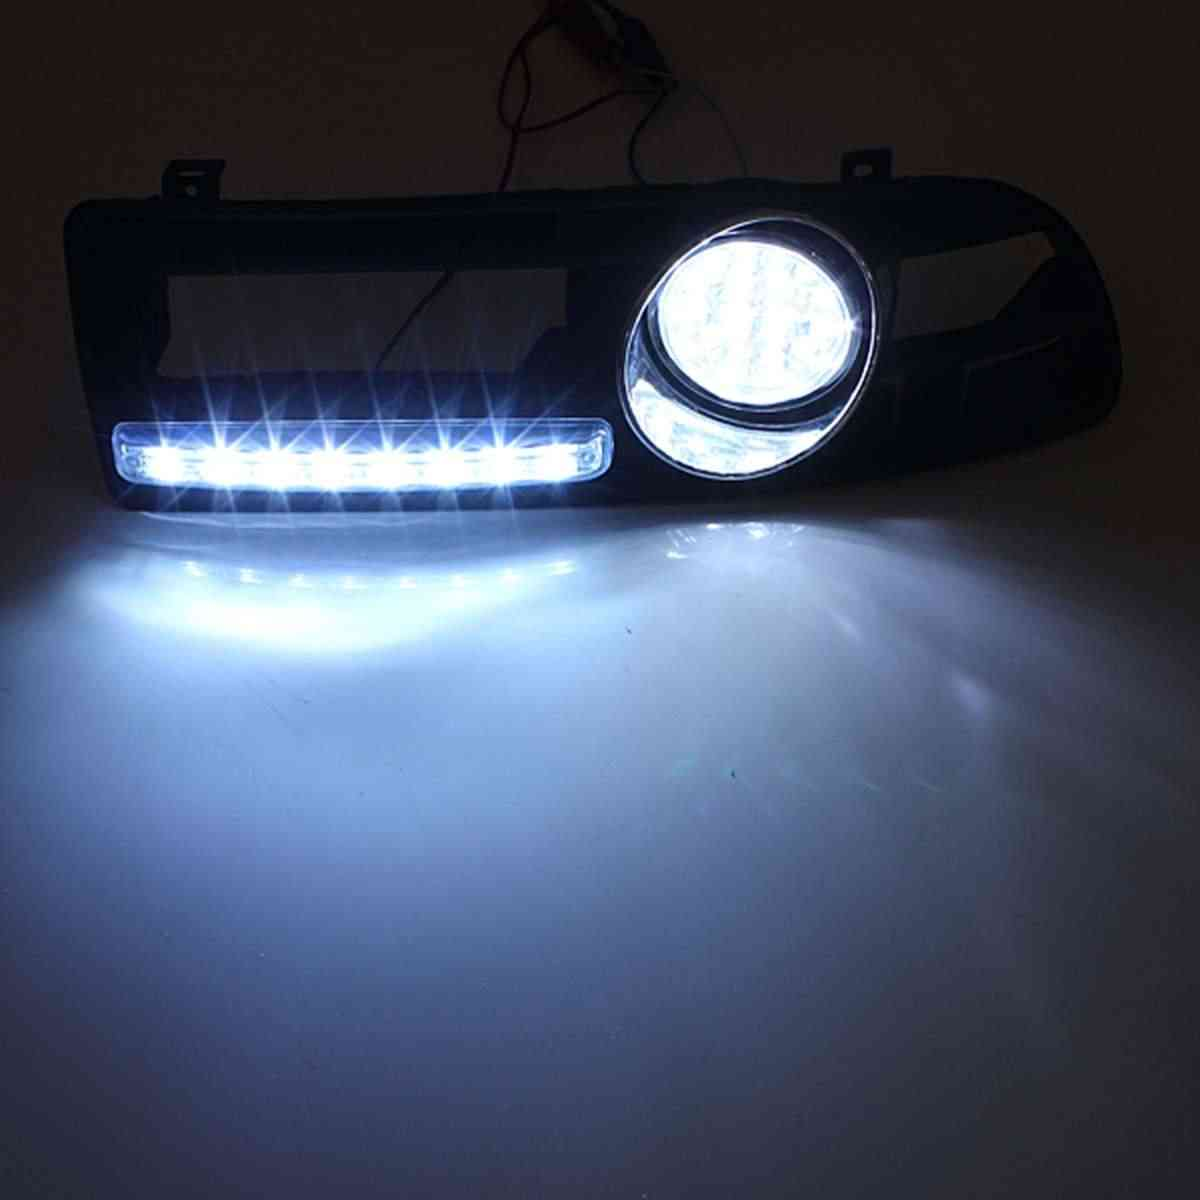 1 компл. 8LED противотуманный светильник DRL бампер Гриль жгут проводов реле для VW Jetta/Bora Mk4 1999 2000 2001 2002 2003 2004